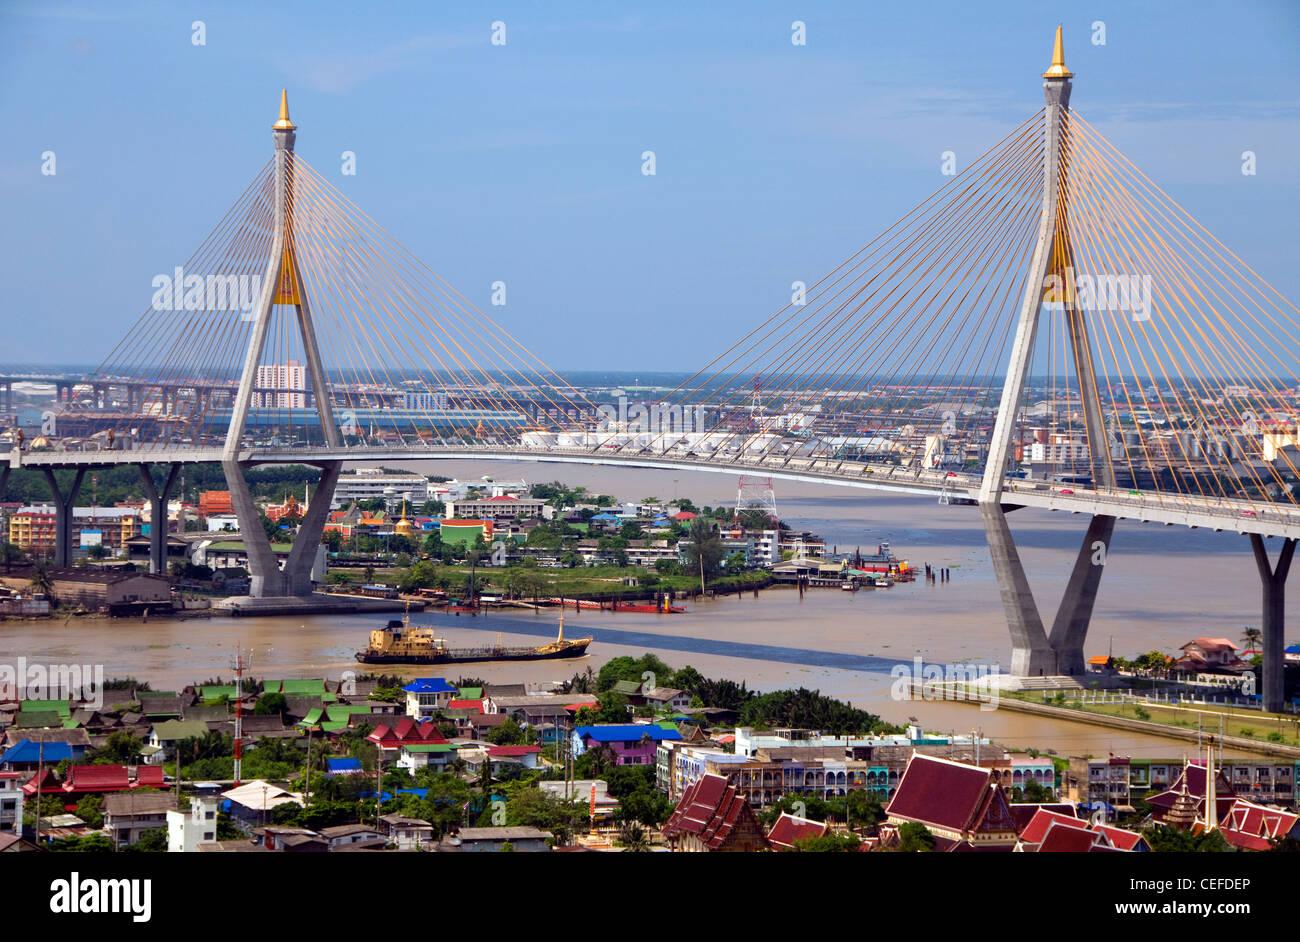 Chao Phraya River, Bhumibol 1 Bridge, mega bridge which makes up the industrial ring road and city skyline, Bangkok, Stock Photo